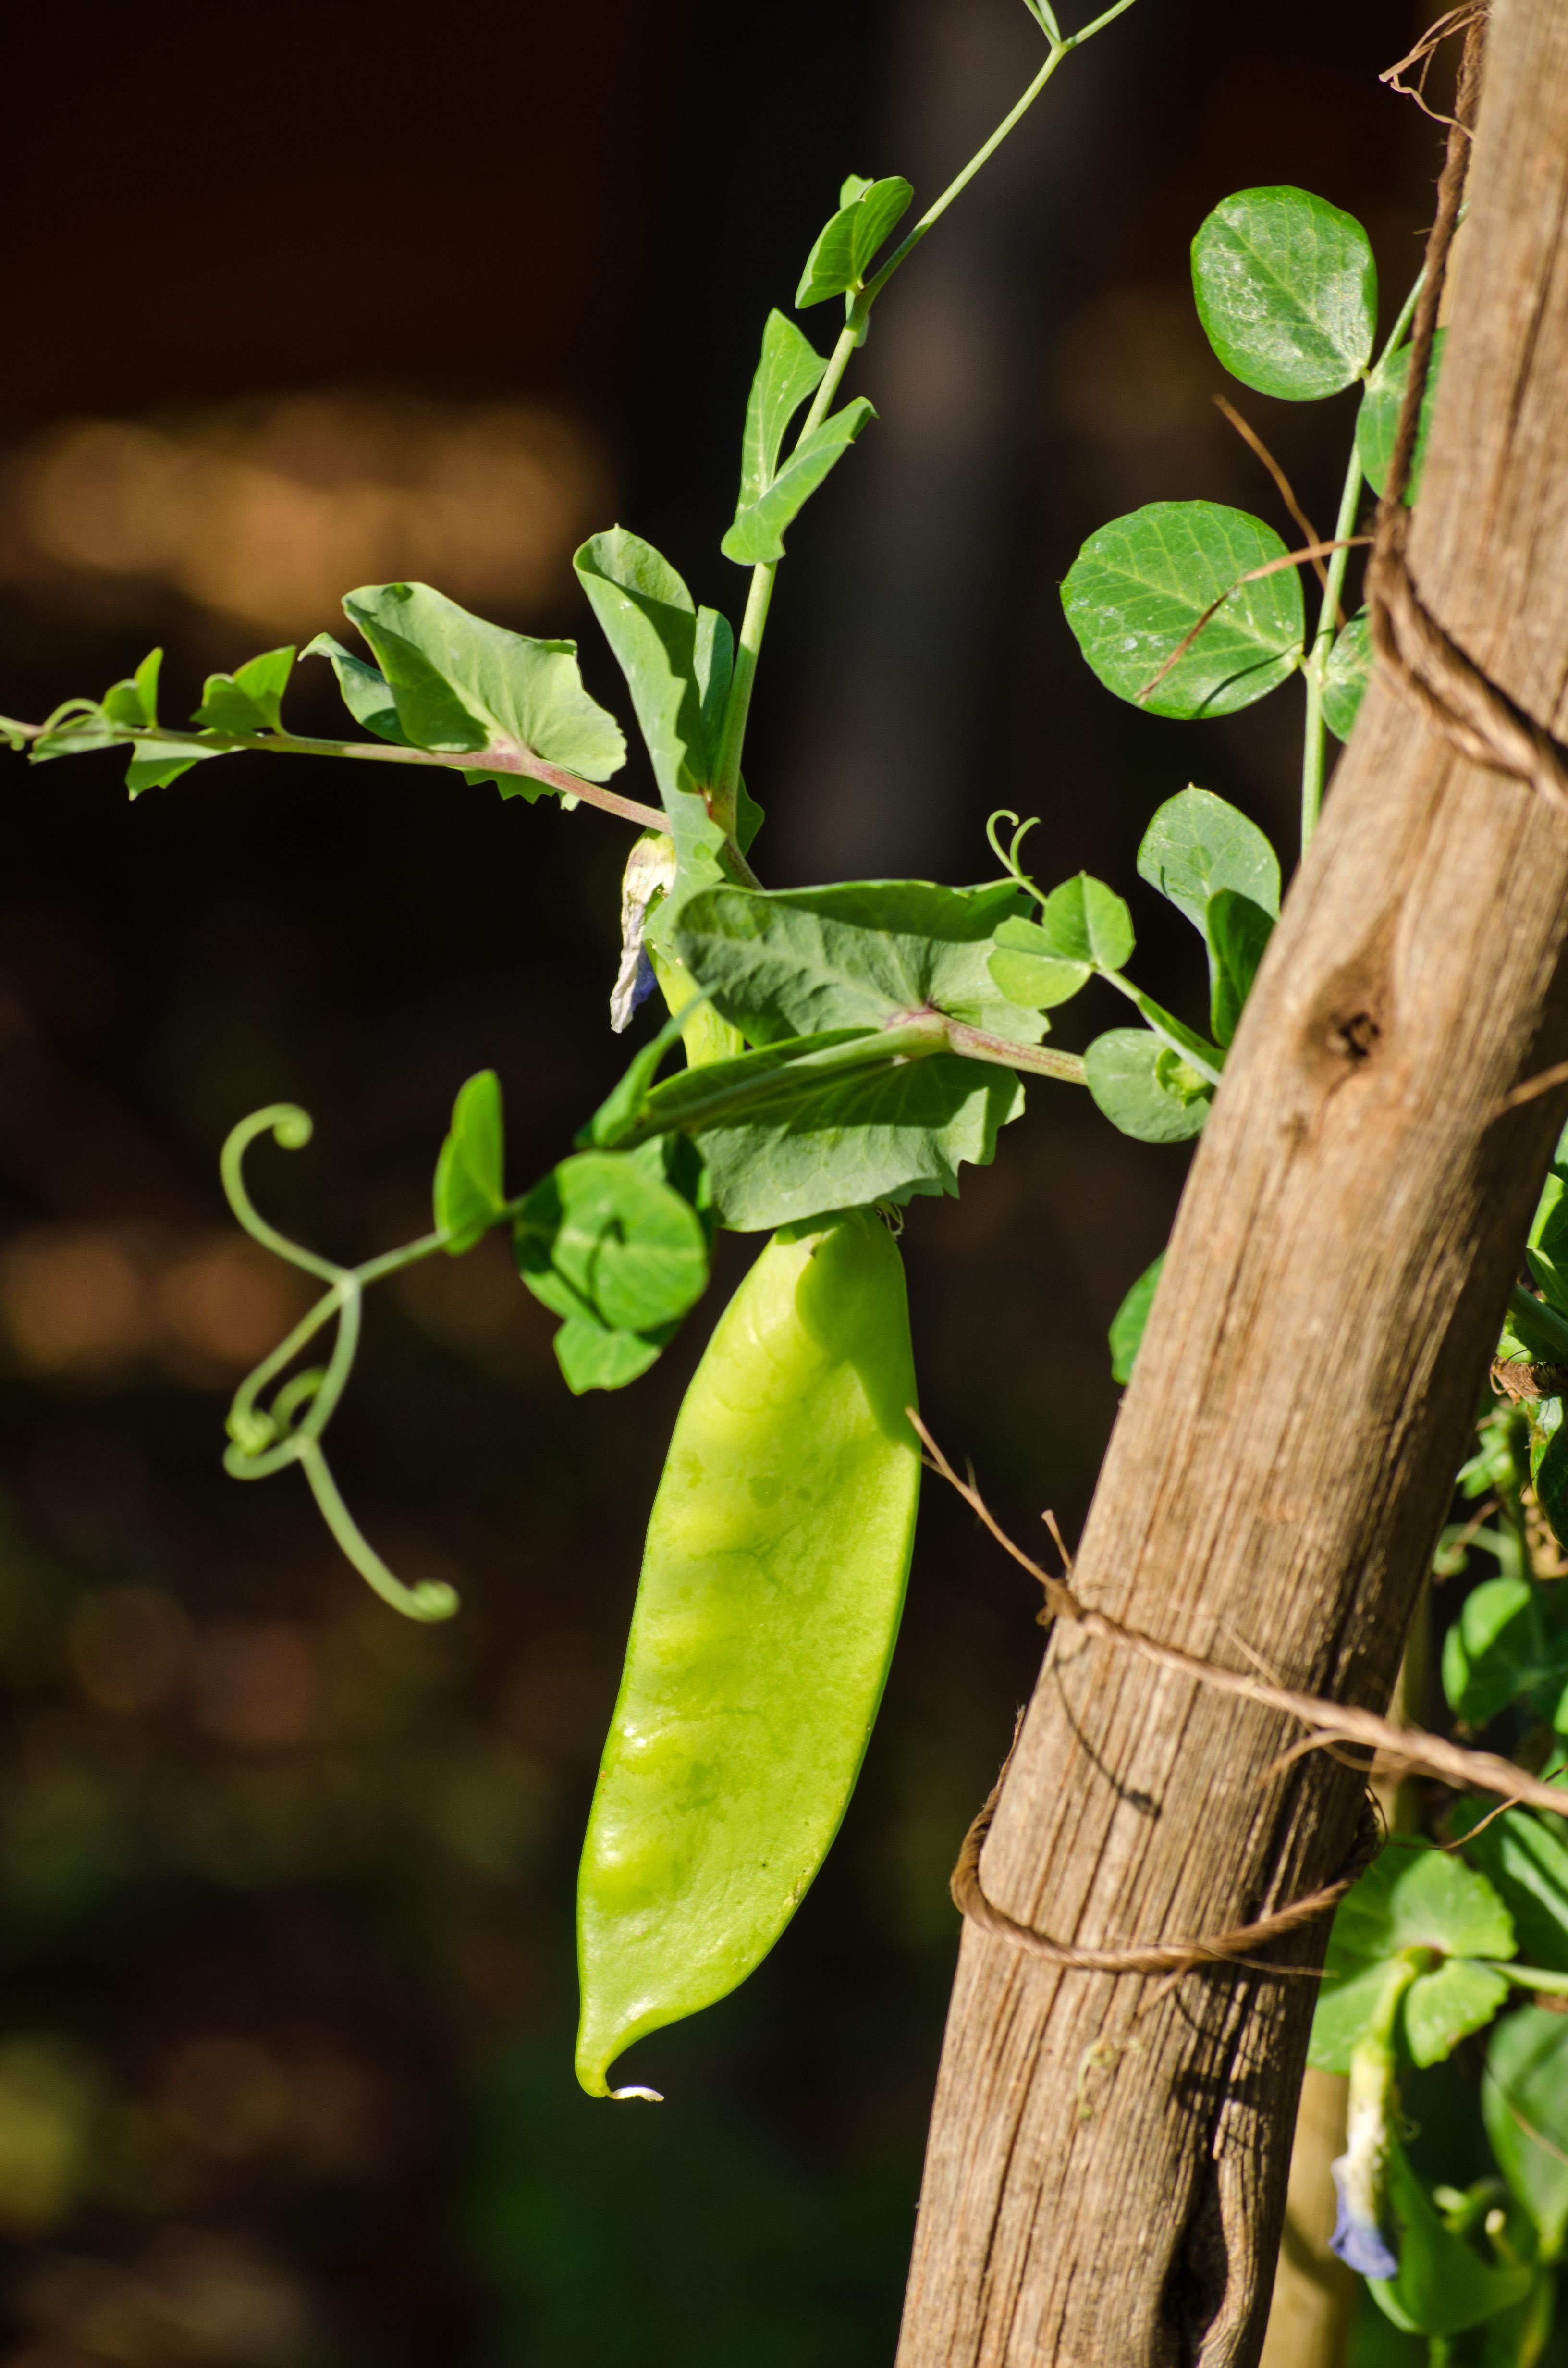 peas lifestyle home garden nursery and plant shop johannesburg gauteng